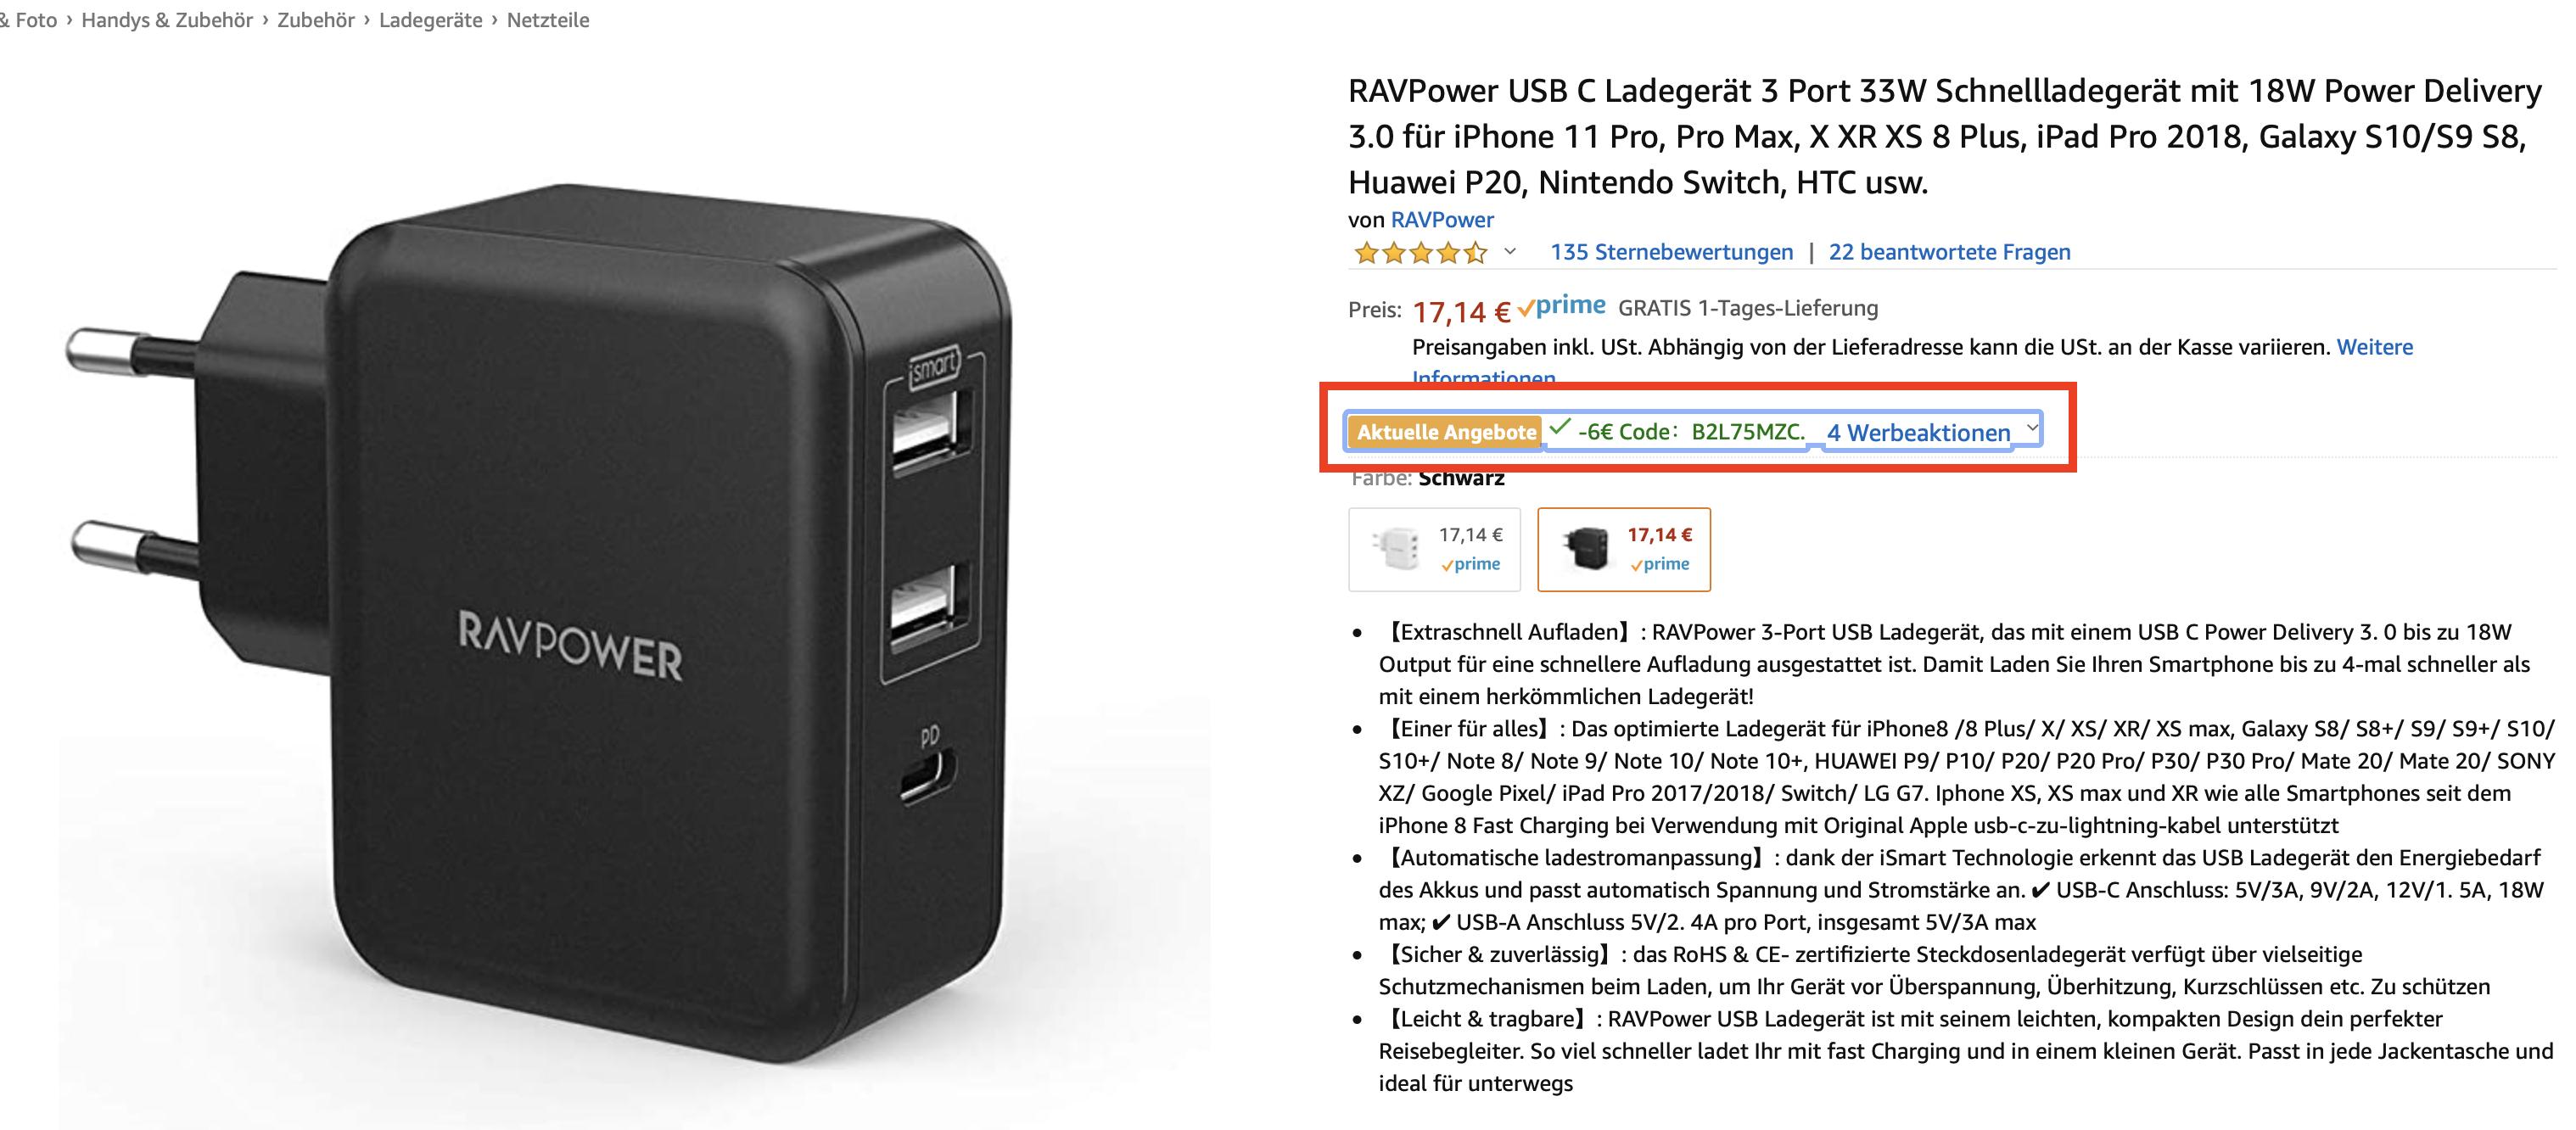 RAVPower USB C Ladegerät 3 Port 33W mit 18W Power Delivery